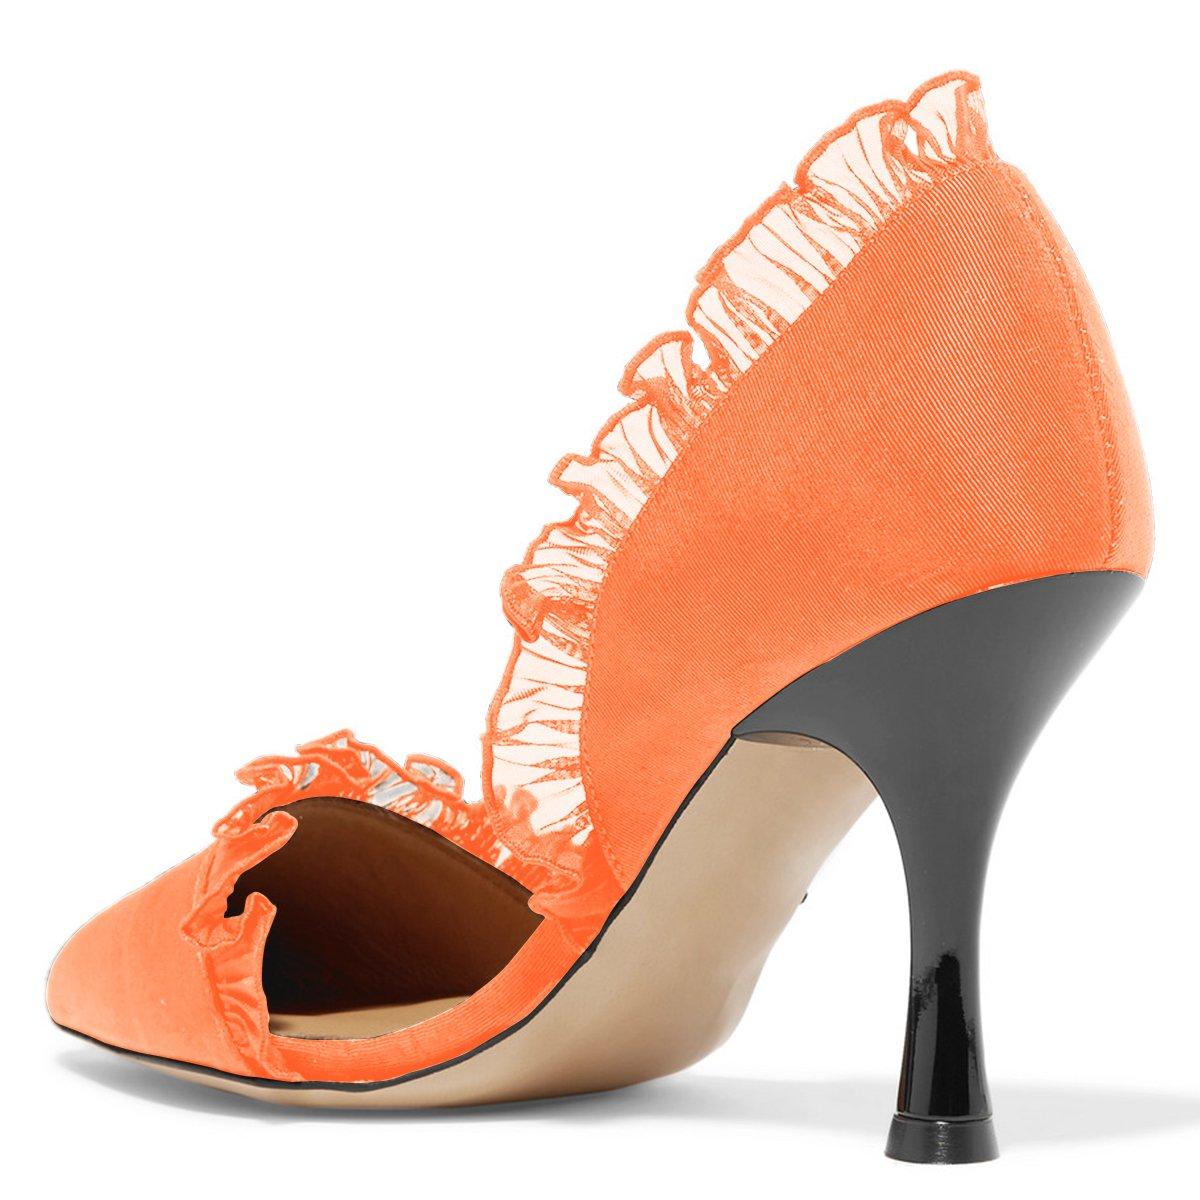 XYD Women Lace D'Orsay Pumps Pointed Toe Stiletto Dress High Heels Slip on Dress Stiletto Wedding Bridal Shoes B07BHG8QF5 14 B(M) US|Orange 231ad7